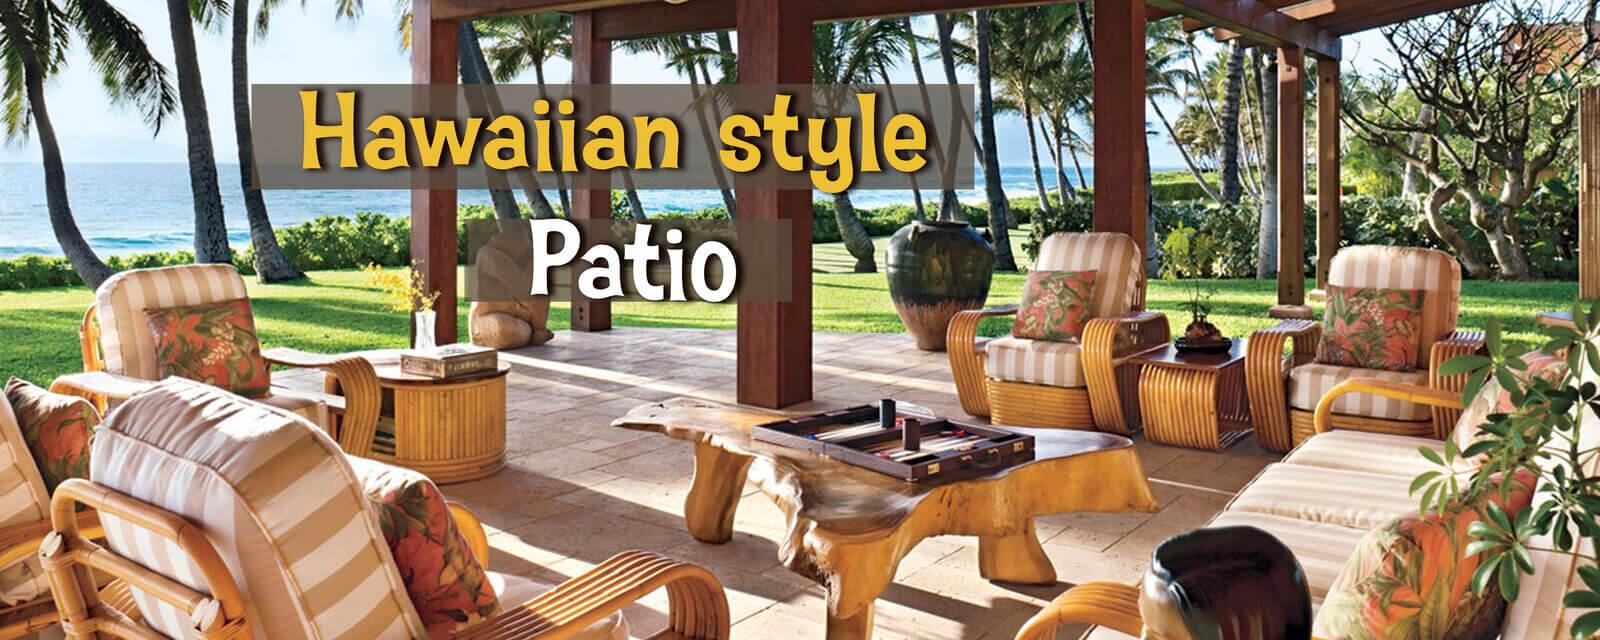 Hawaiian Style   Patio